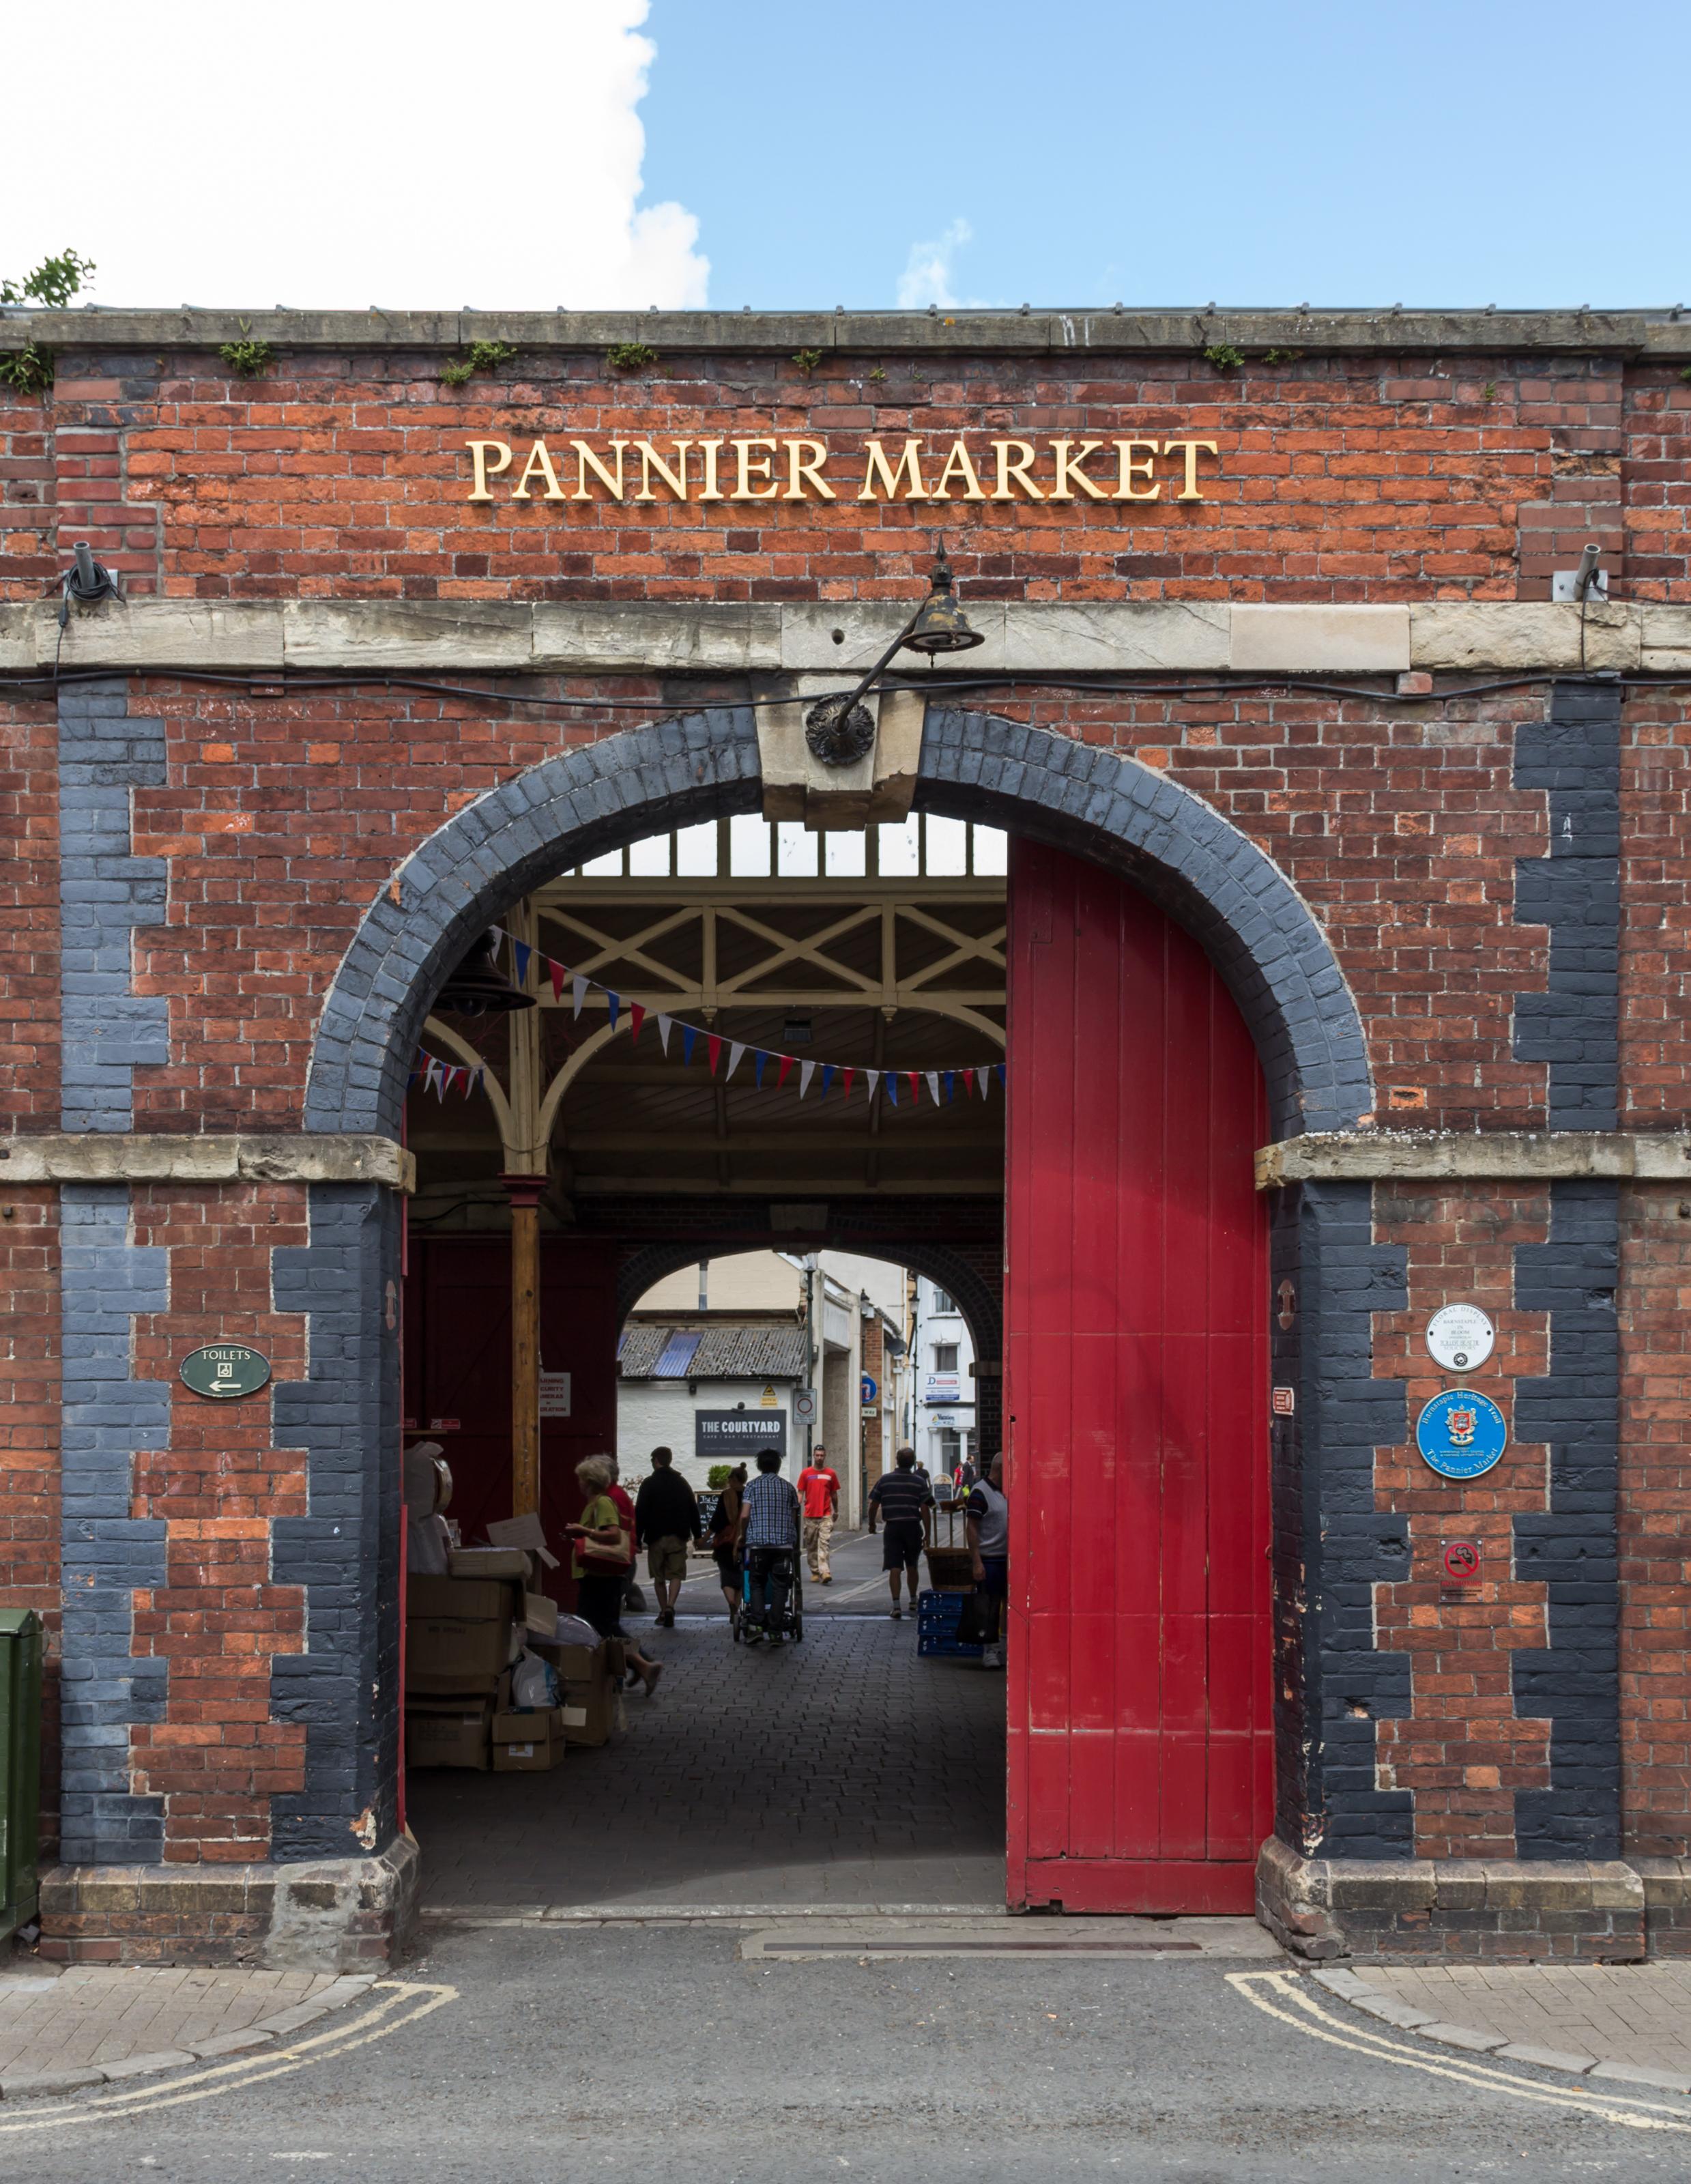 FileBarnstaple (Devon UK) Pannier Market -- 2013 -- & File:Barnstaple (Devon UK) Pannier Market -- 2013 -- 5.jpg ...